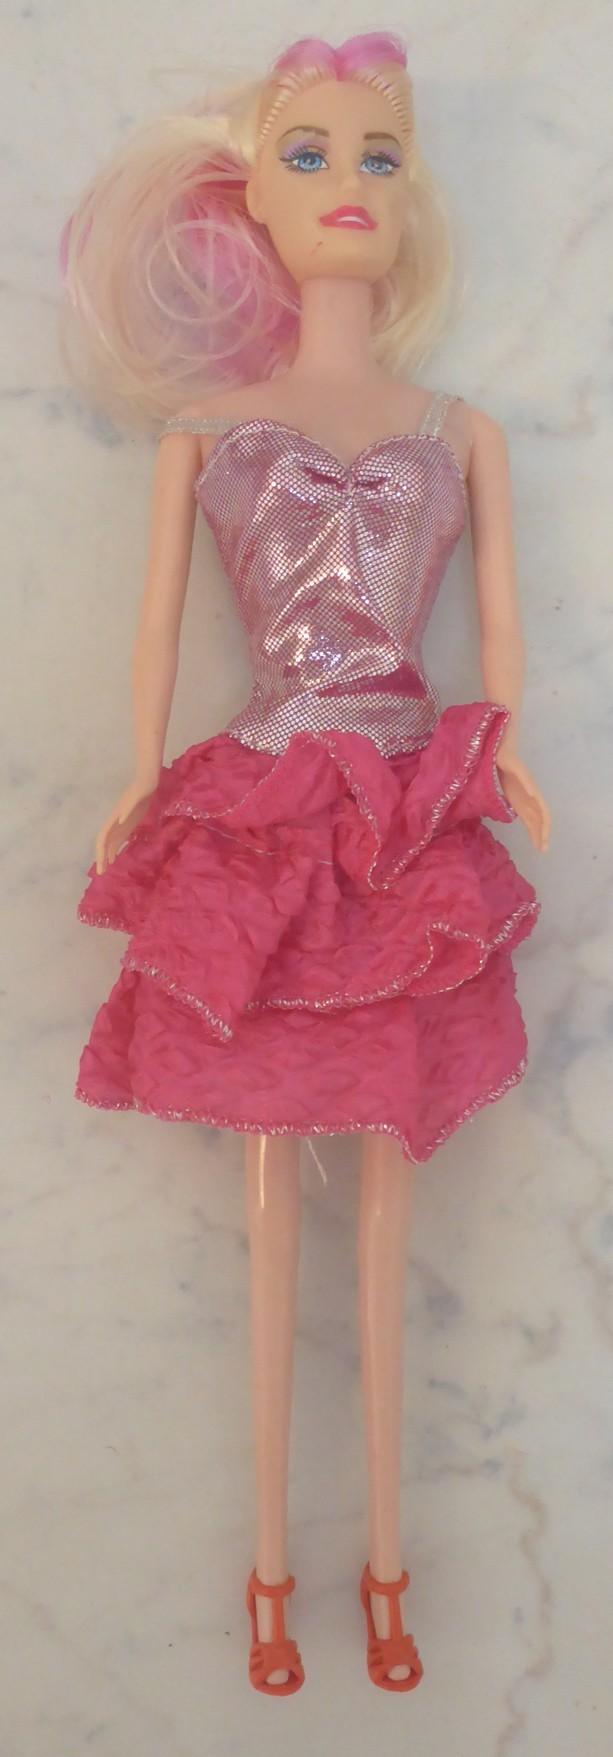 nv_babika_typu_barbie2